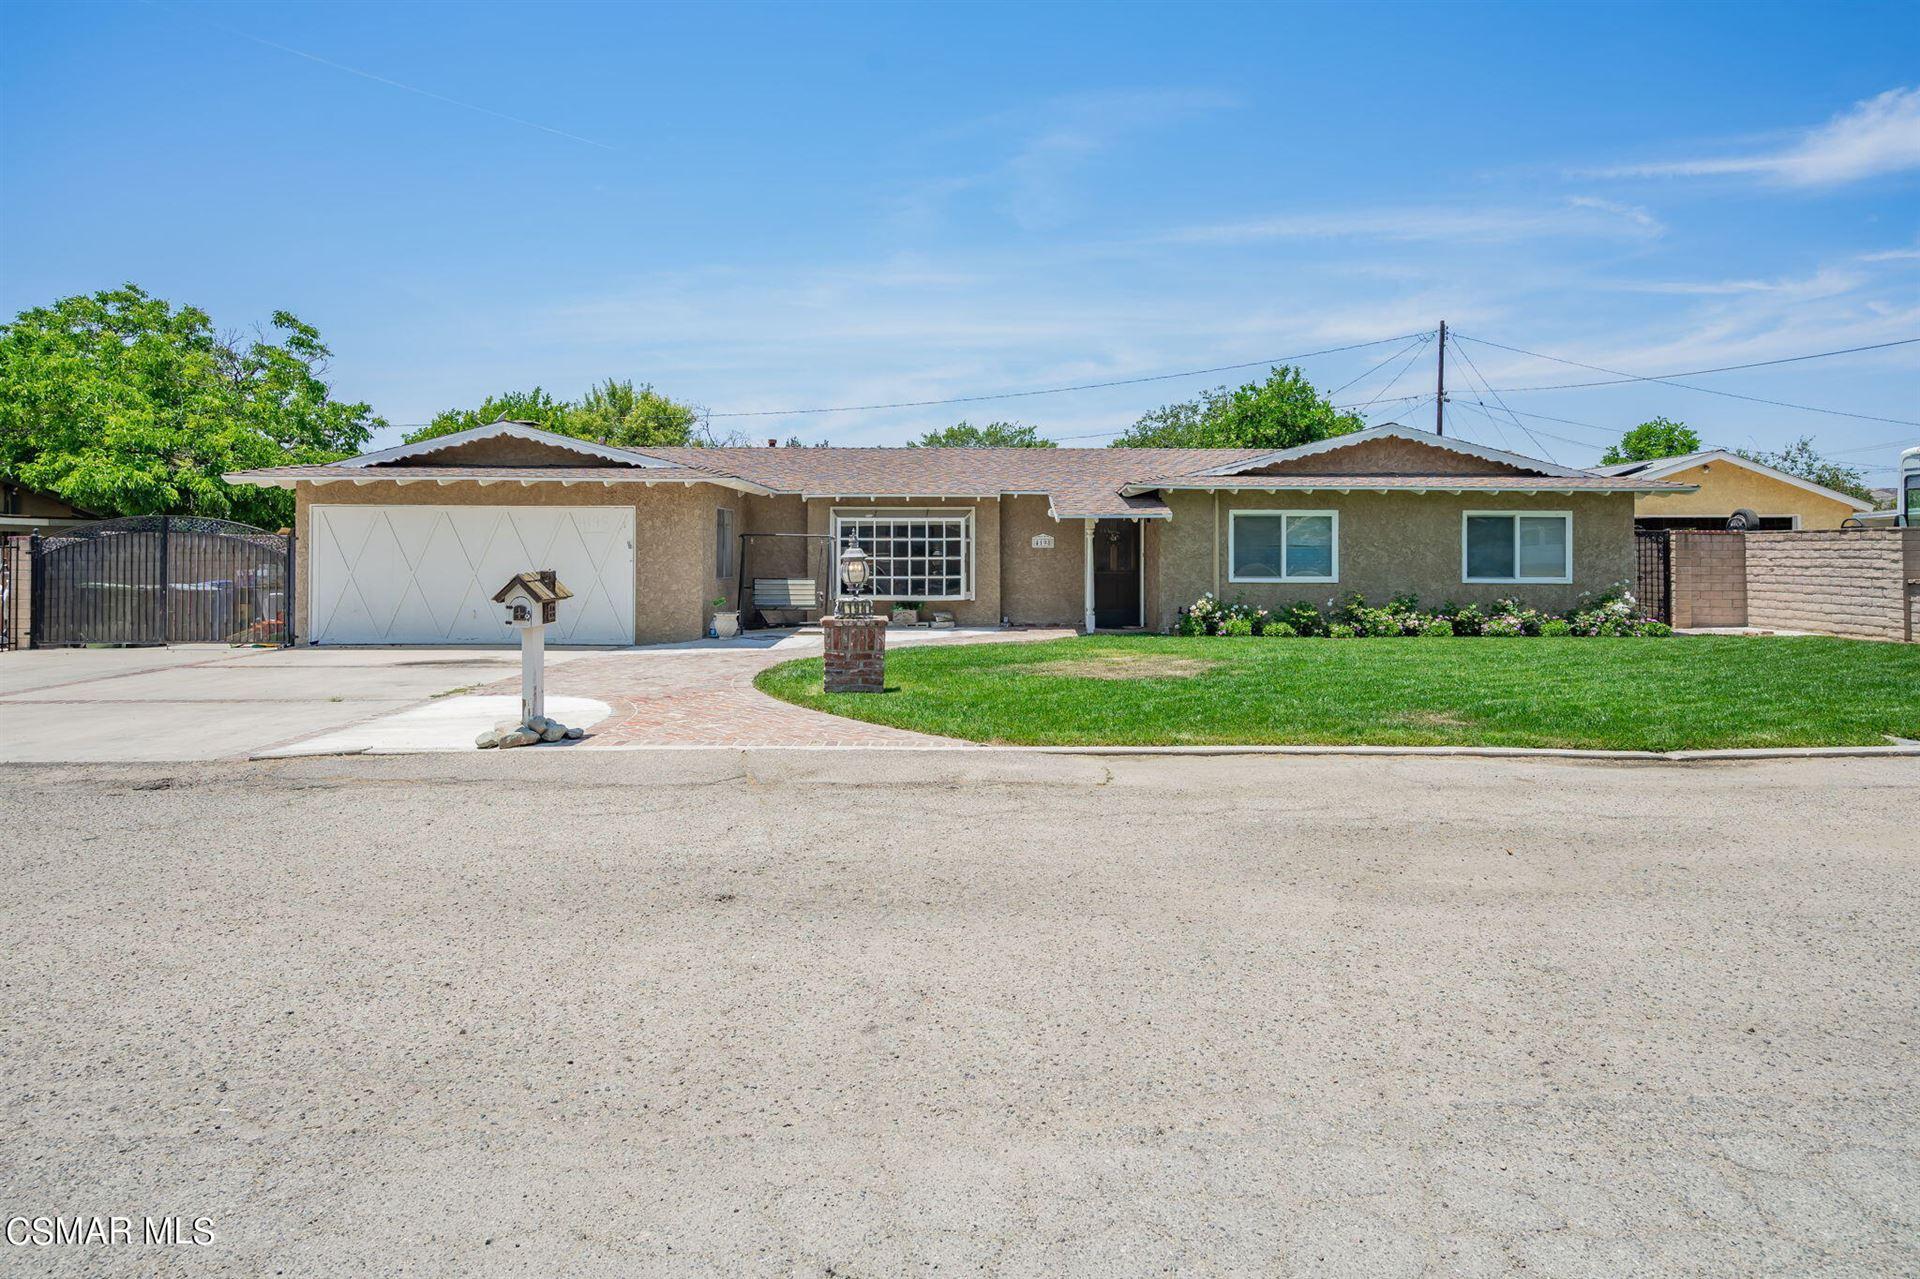 4198 Adam Road, Simi Valley, CA 93063 - MLS#: 221003286